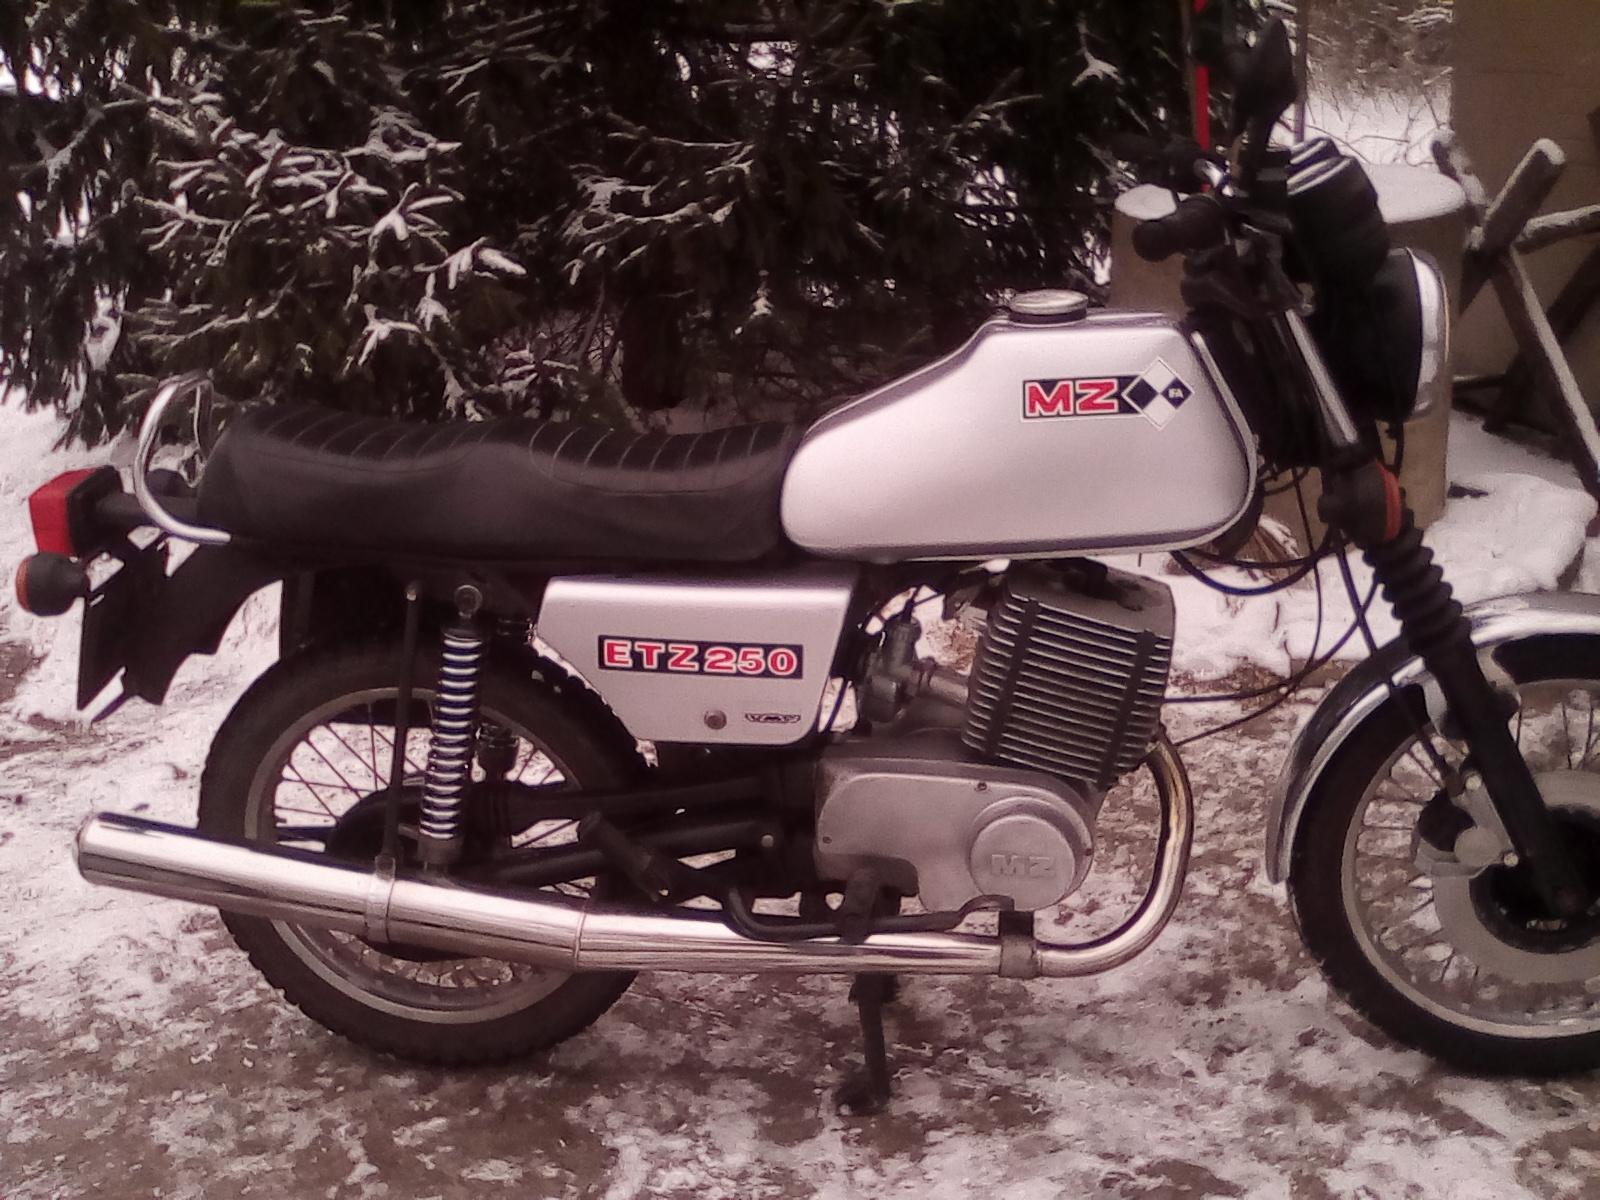 MZ 250, 1. kép